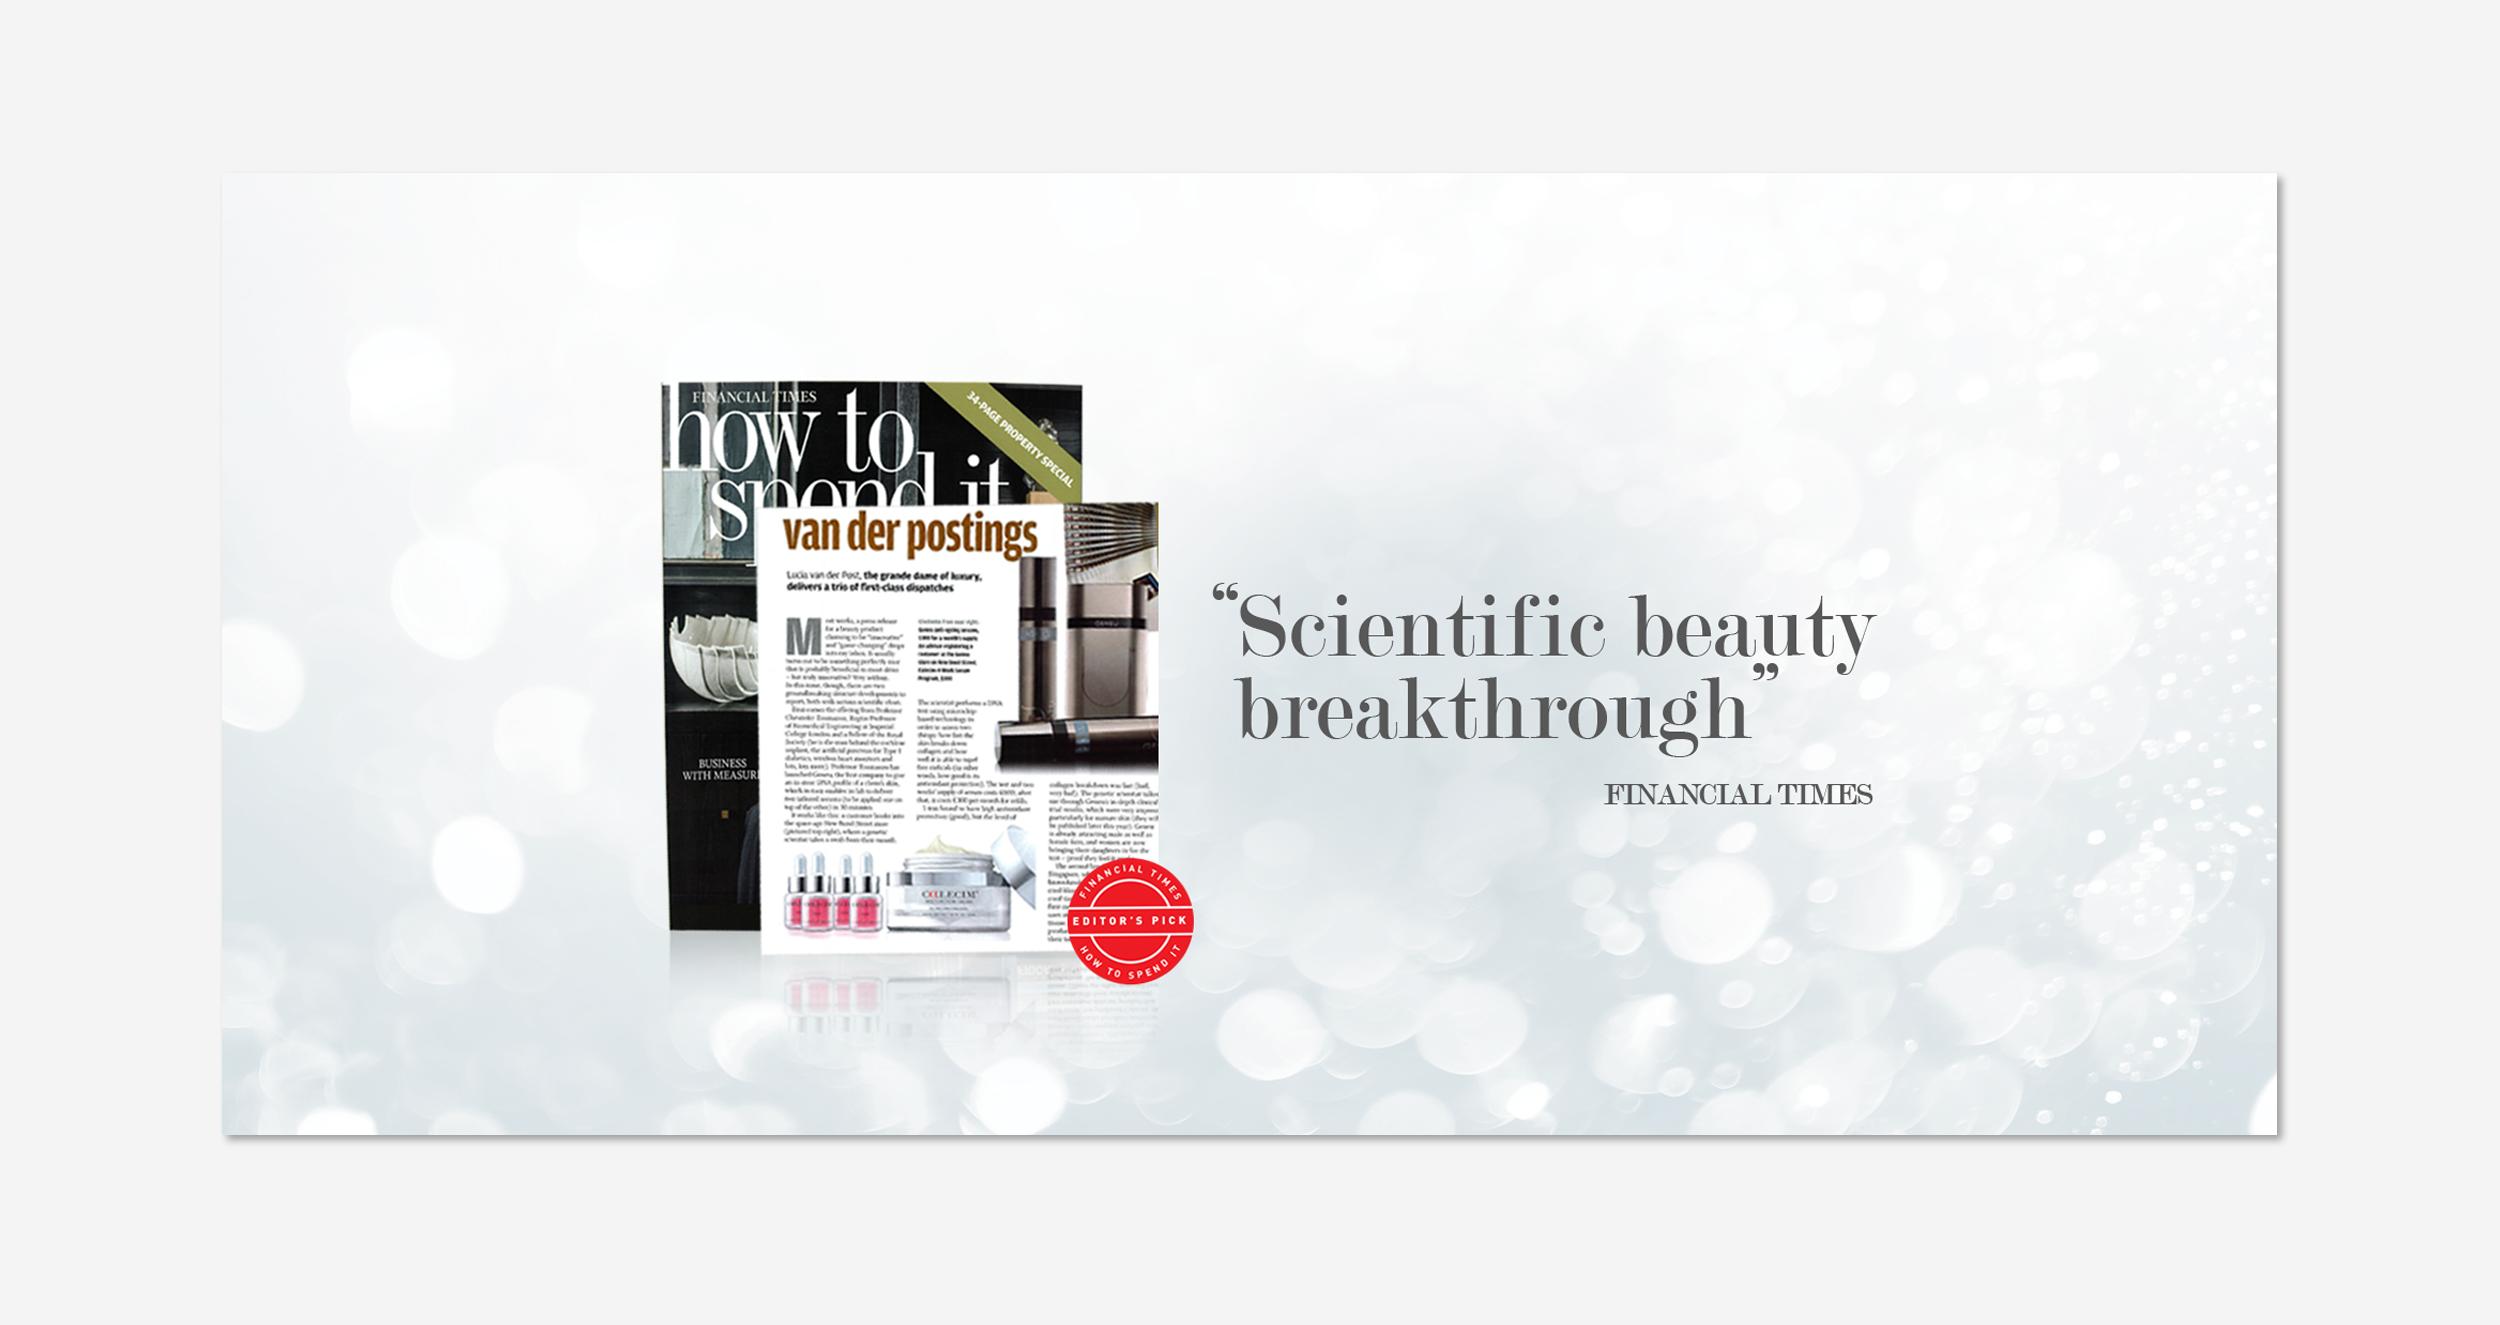 Scientific beauty breakthrough.